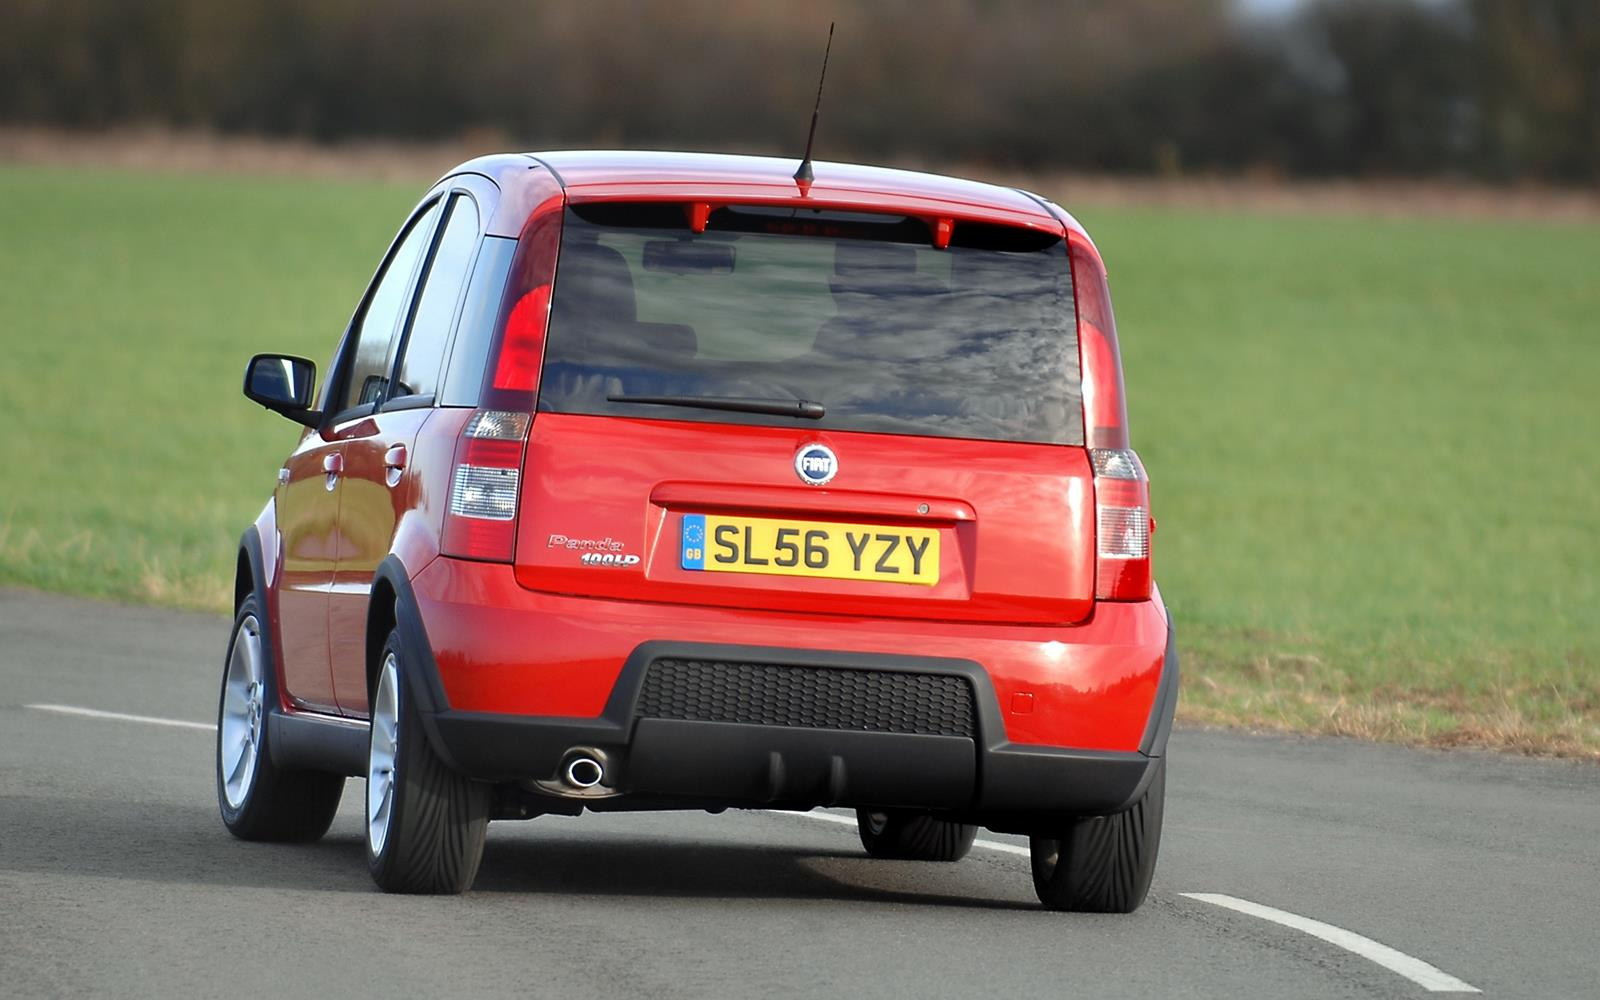 Fiat Panda 100HP 2006 Rear Dynamic